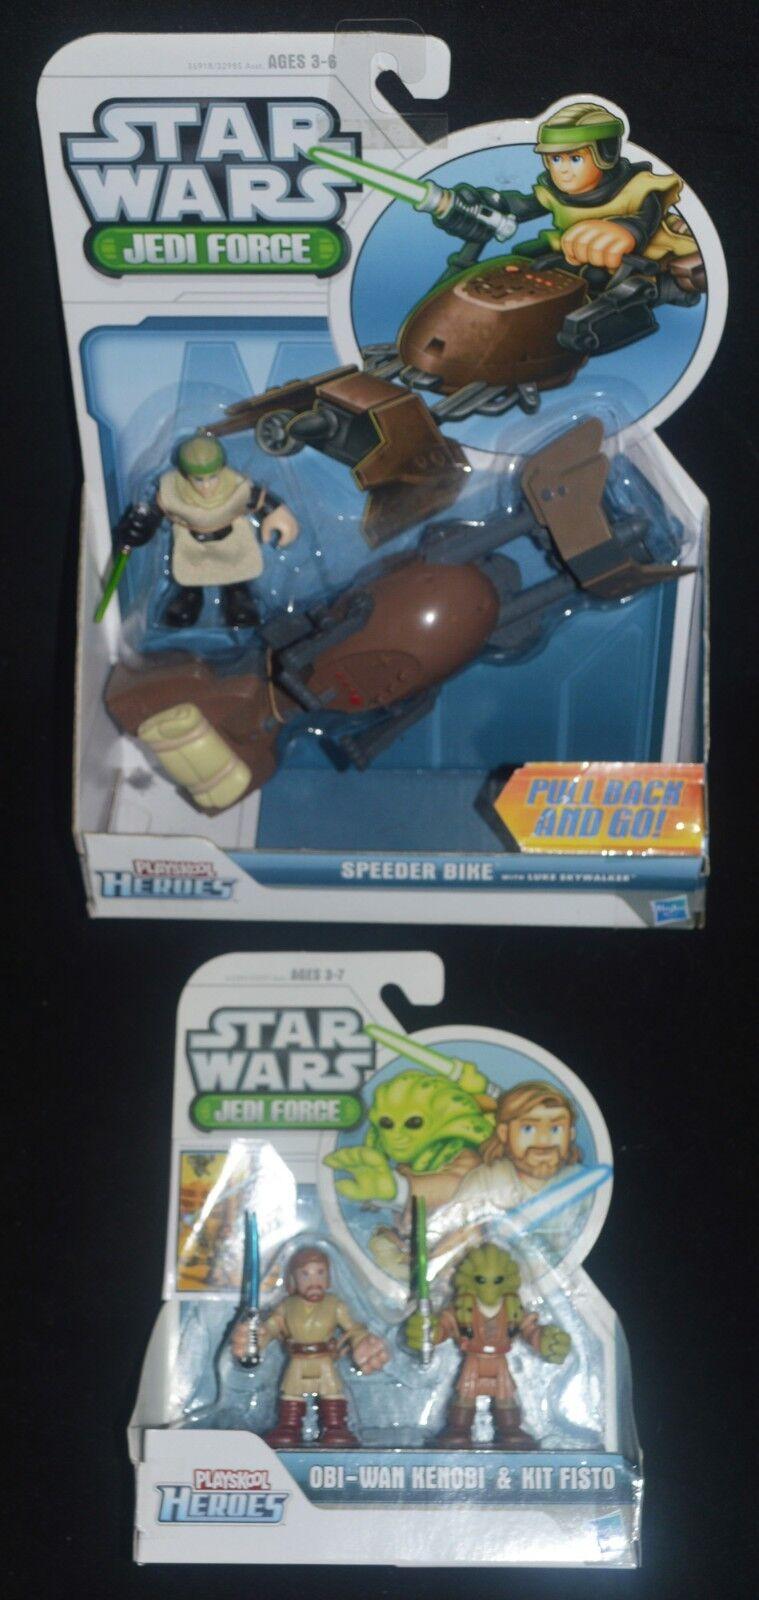 STAR WARS Jedi Force OBI-WAN & KIT FISTO and LUKE SPEEDER Playskool Heroes MIP